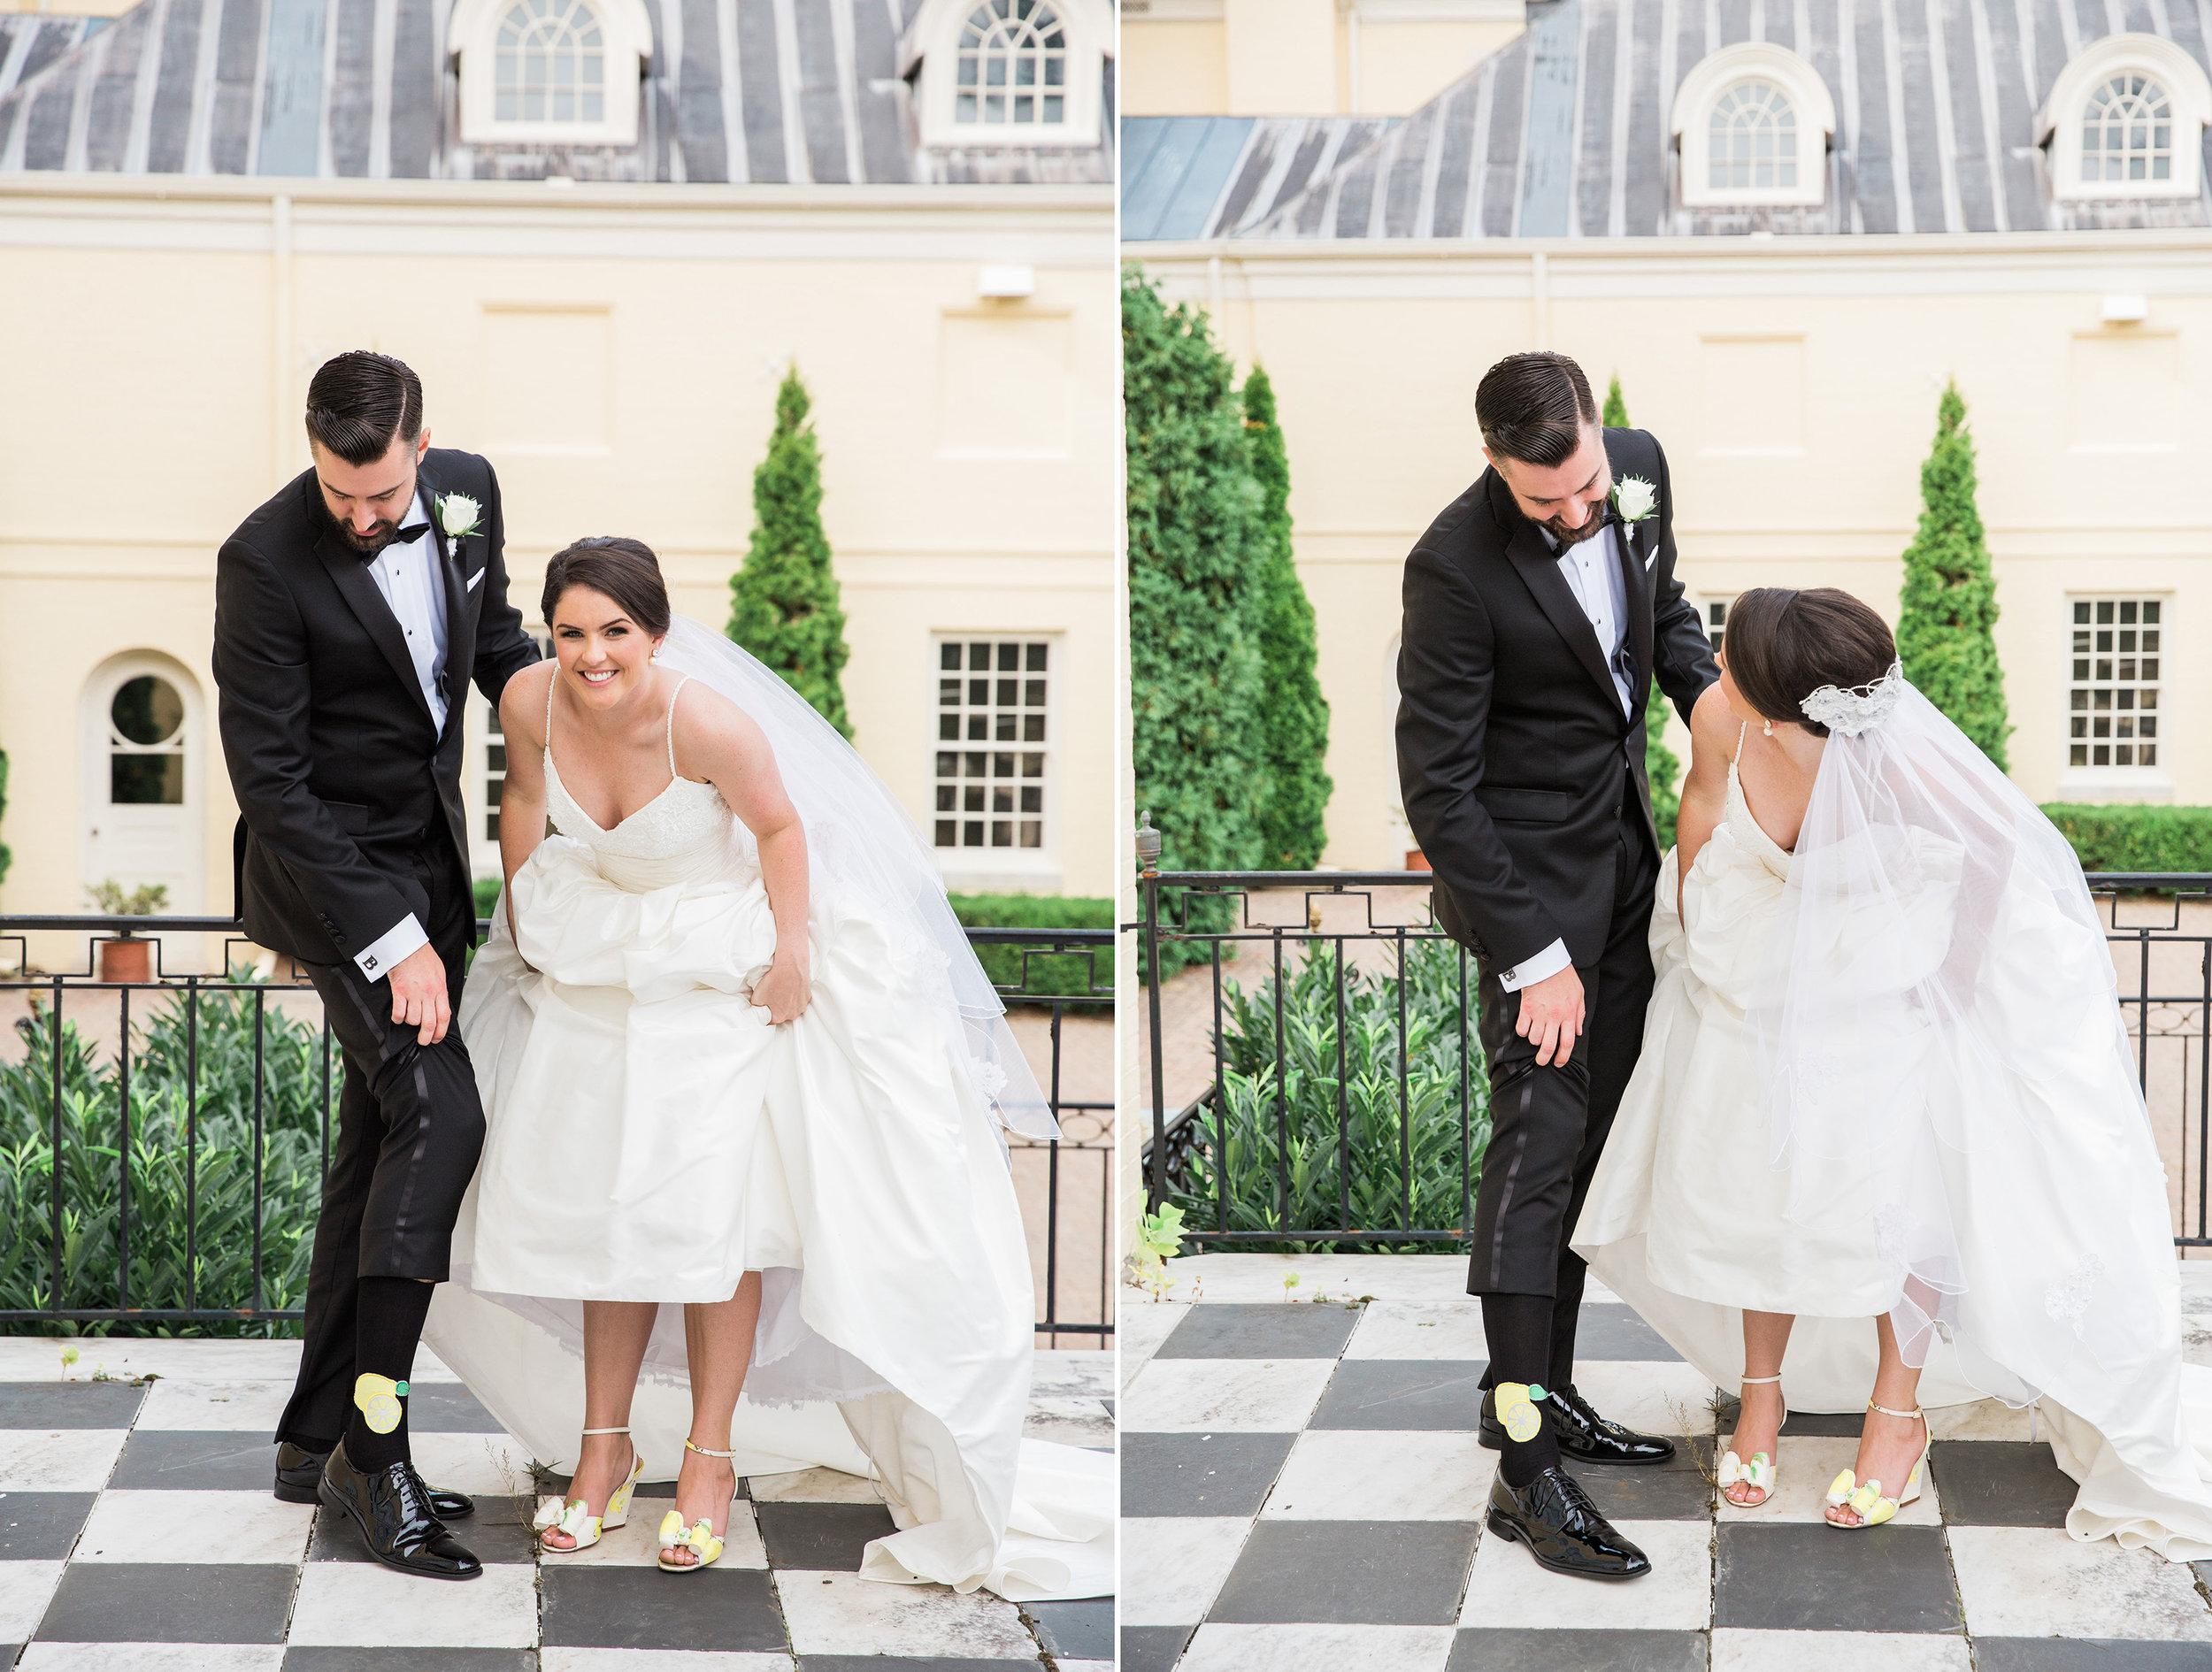 Evergreen-Museum-Balitmore-Maryland-Wedding-Black-Tie-Bride-023.jpg